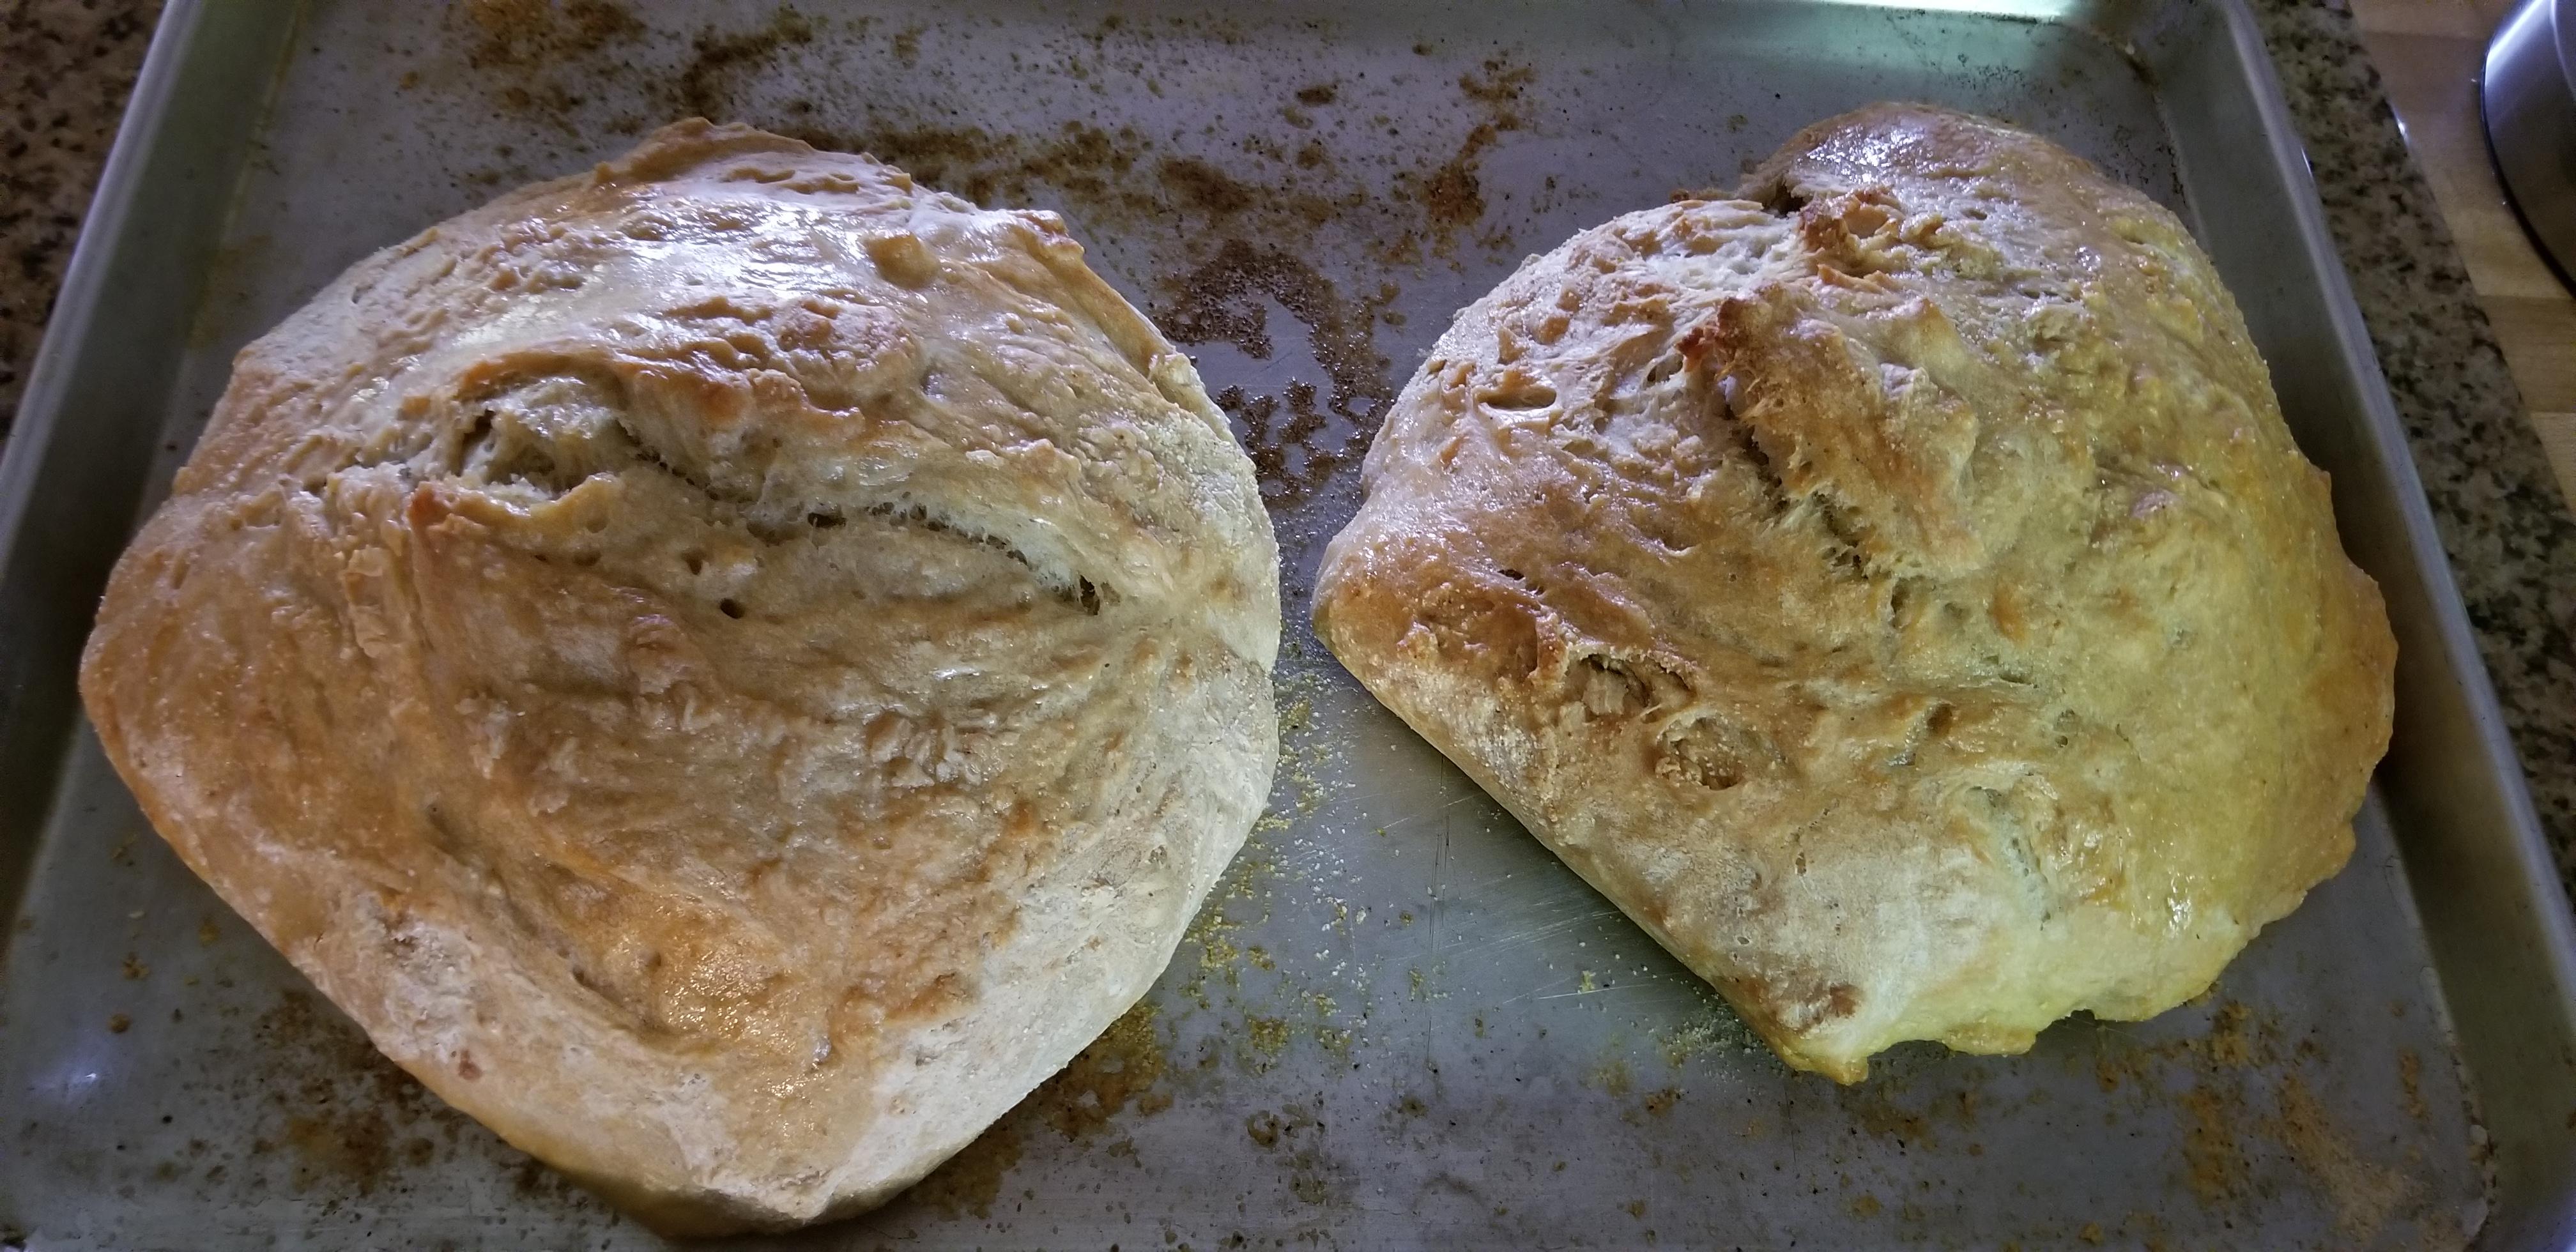 Effortless Rustic Bread Susan Falcone Daquino